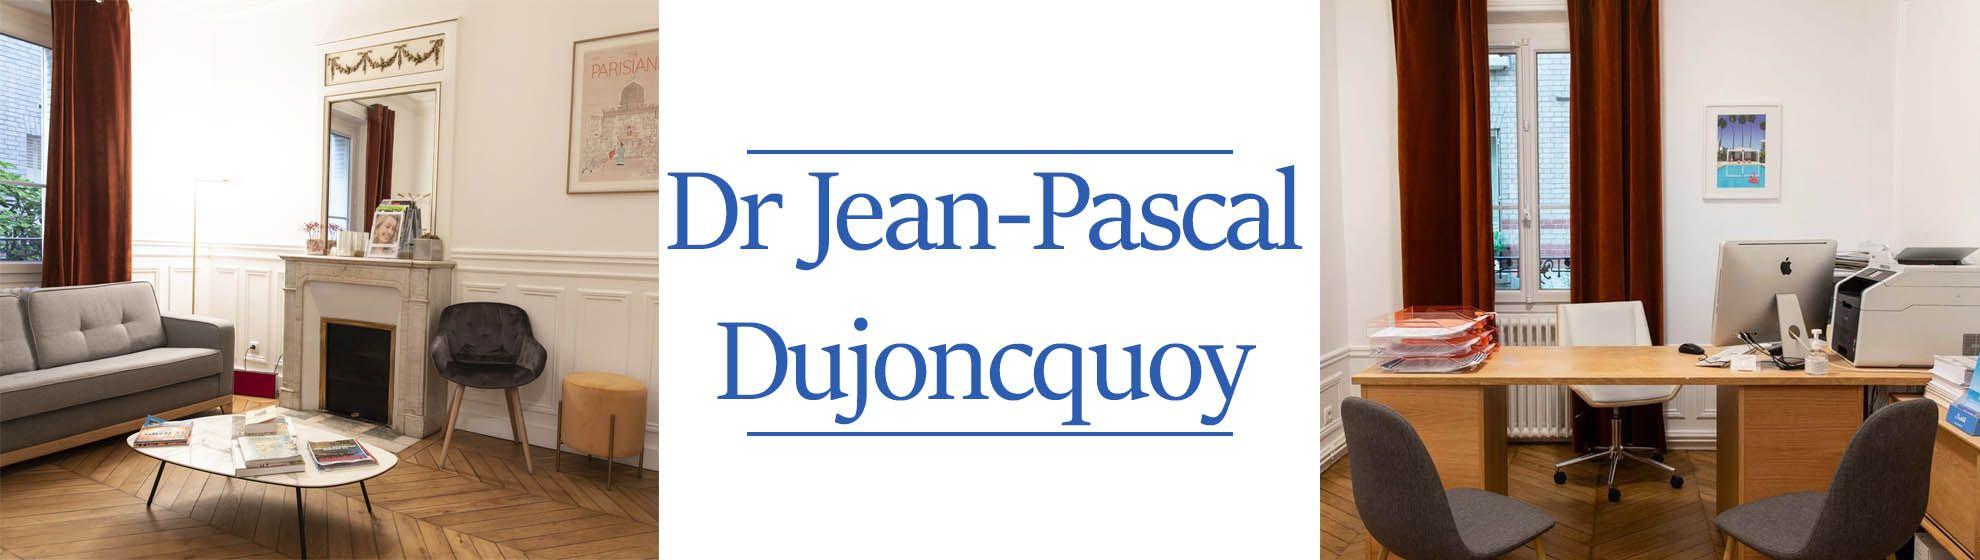 Dr Jean-Pascal Dujoncquoy